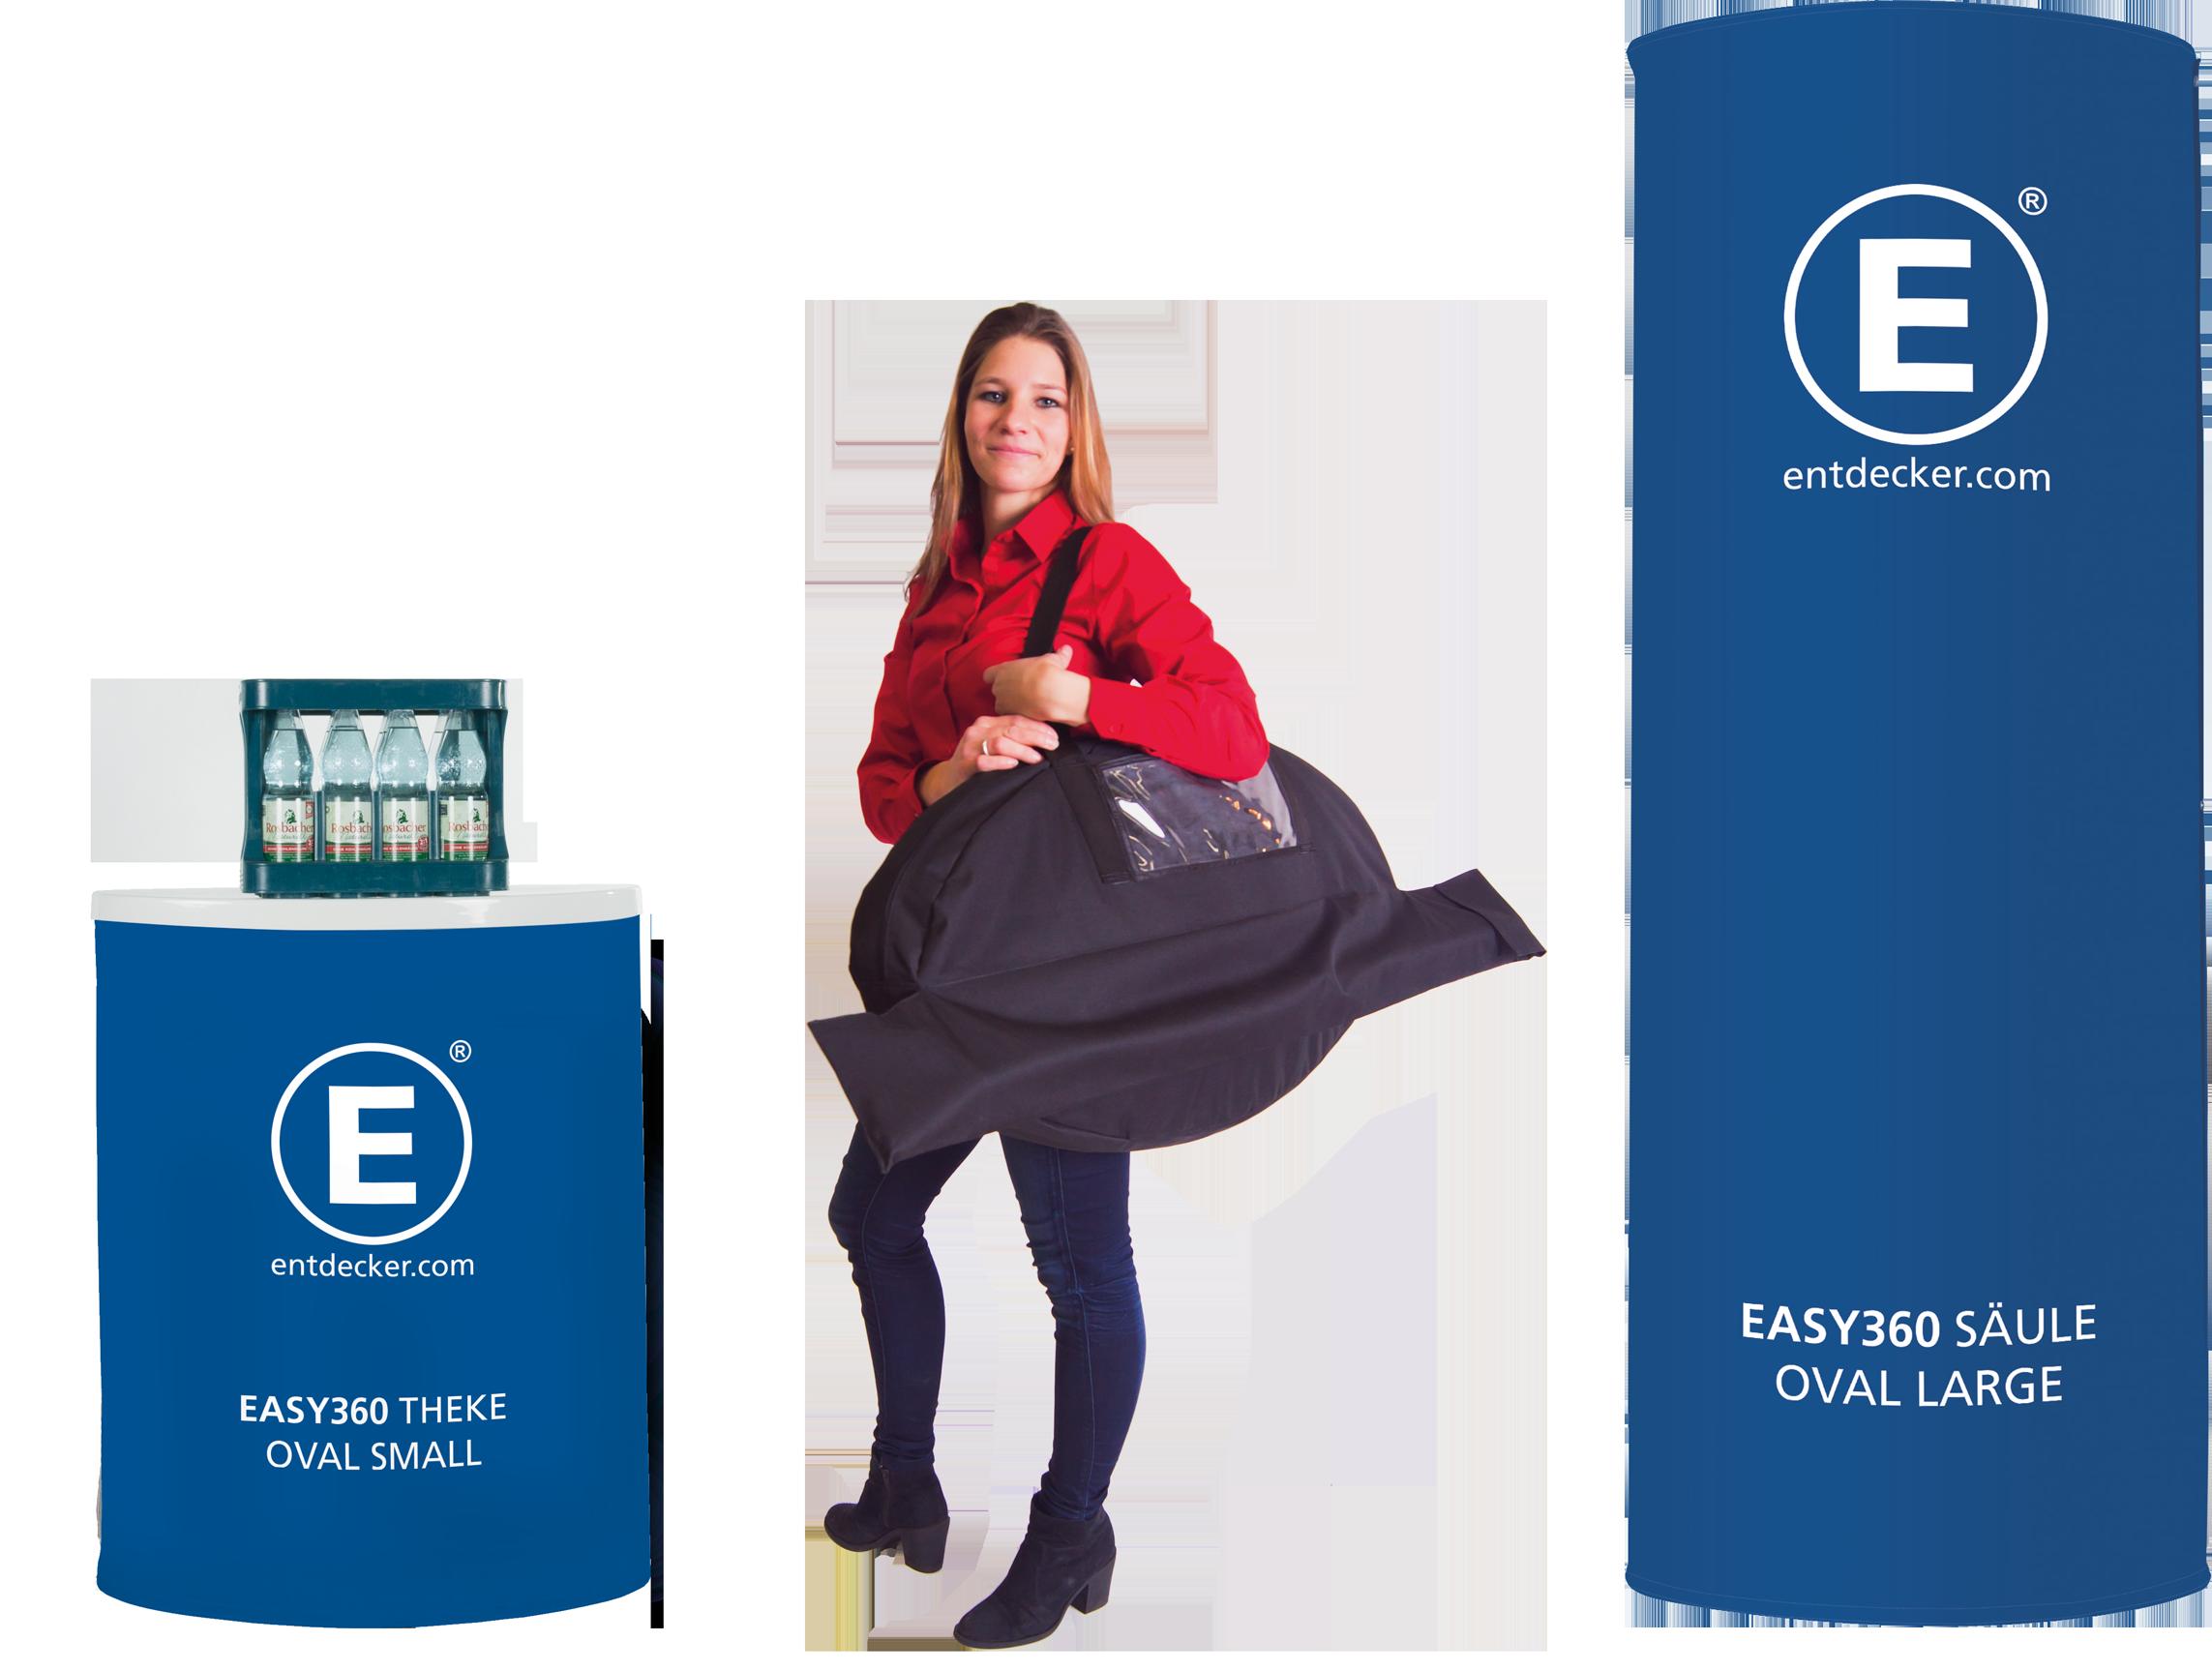 Easy 360 Theke Saeule Tasche